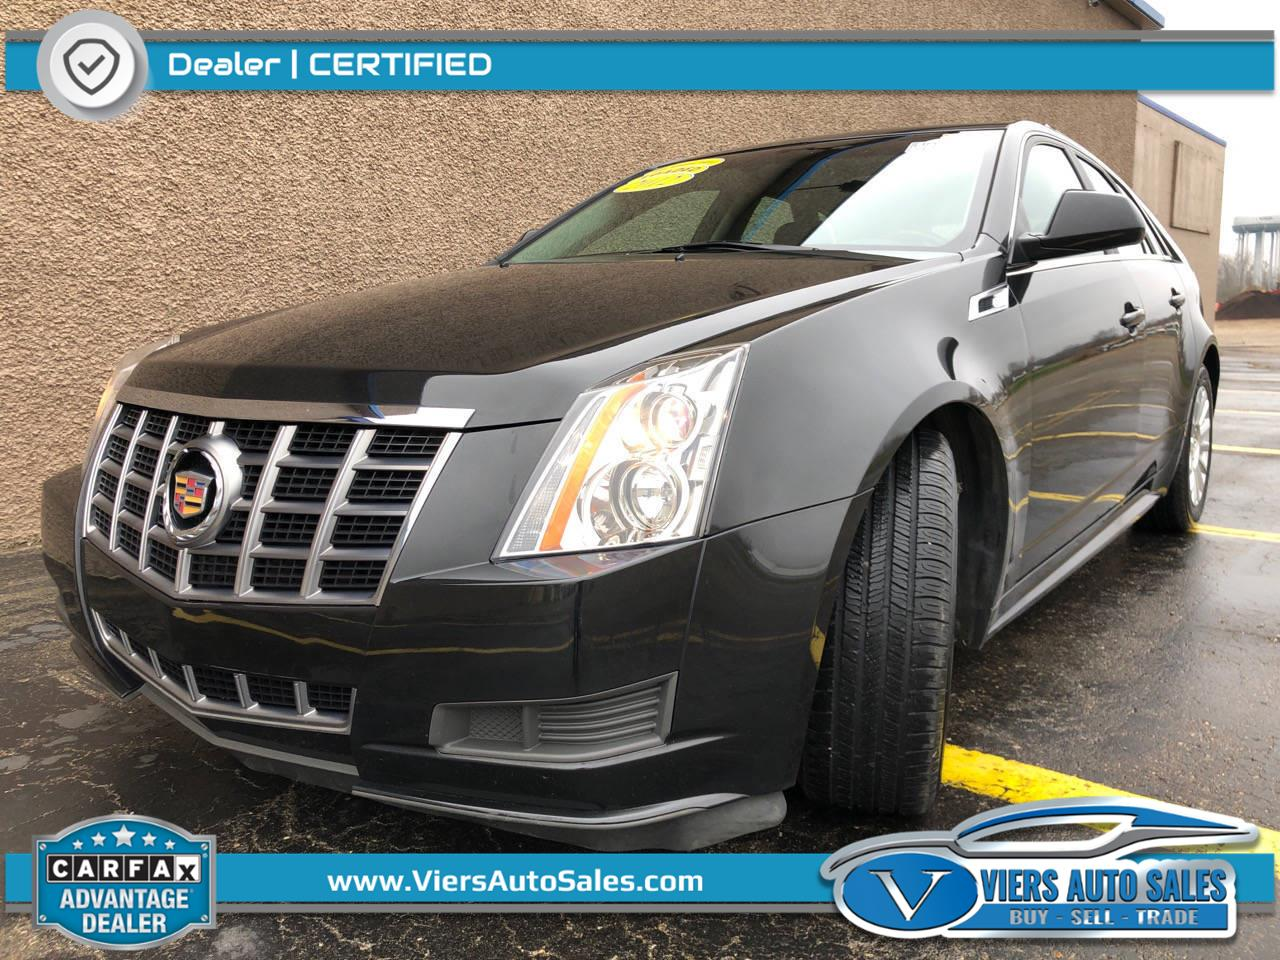 2012 Cadillac CTS Wagon Luxury AWD